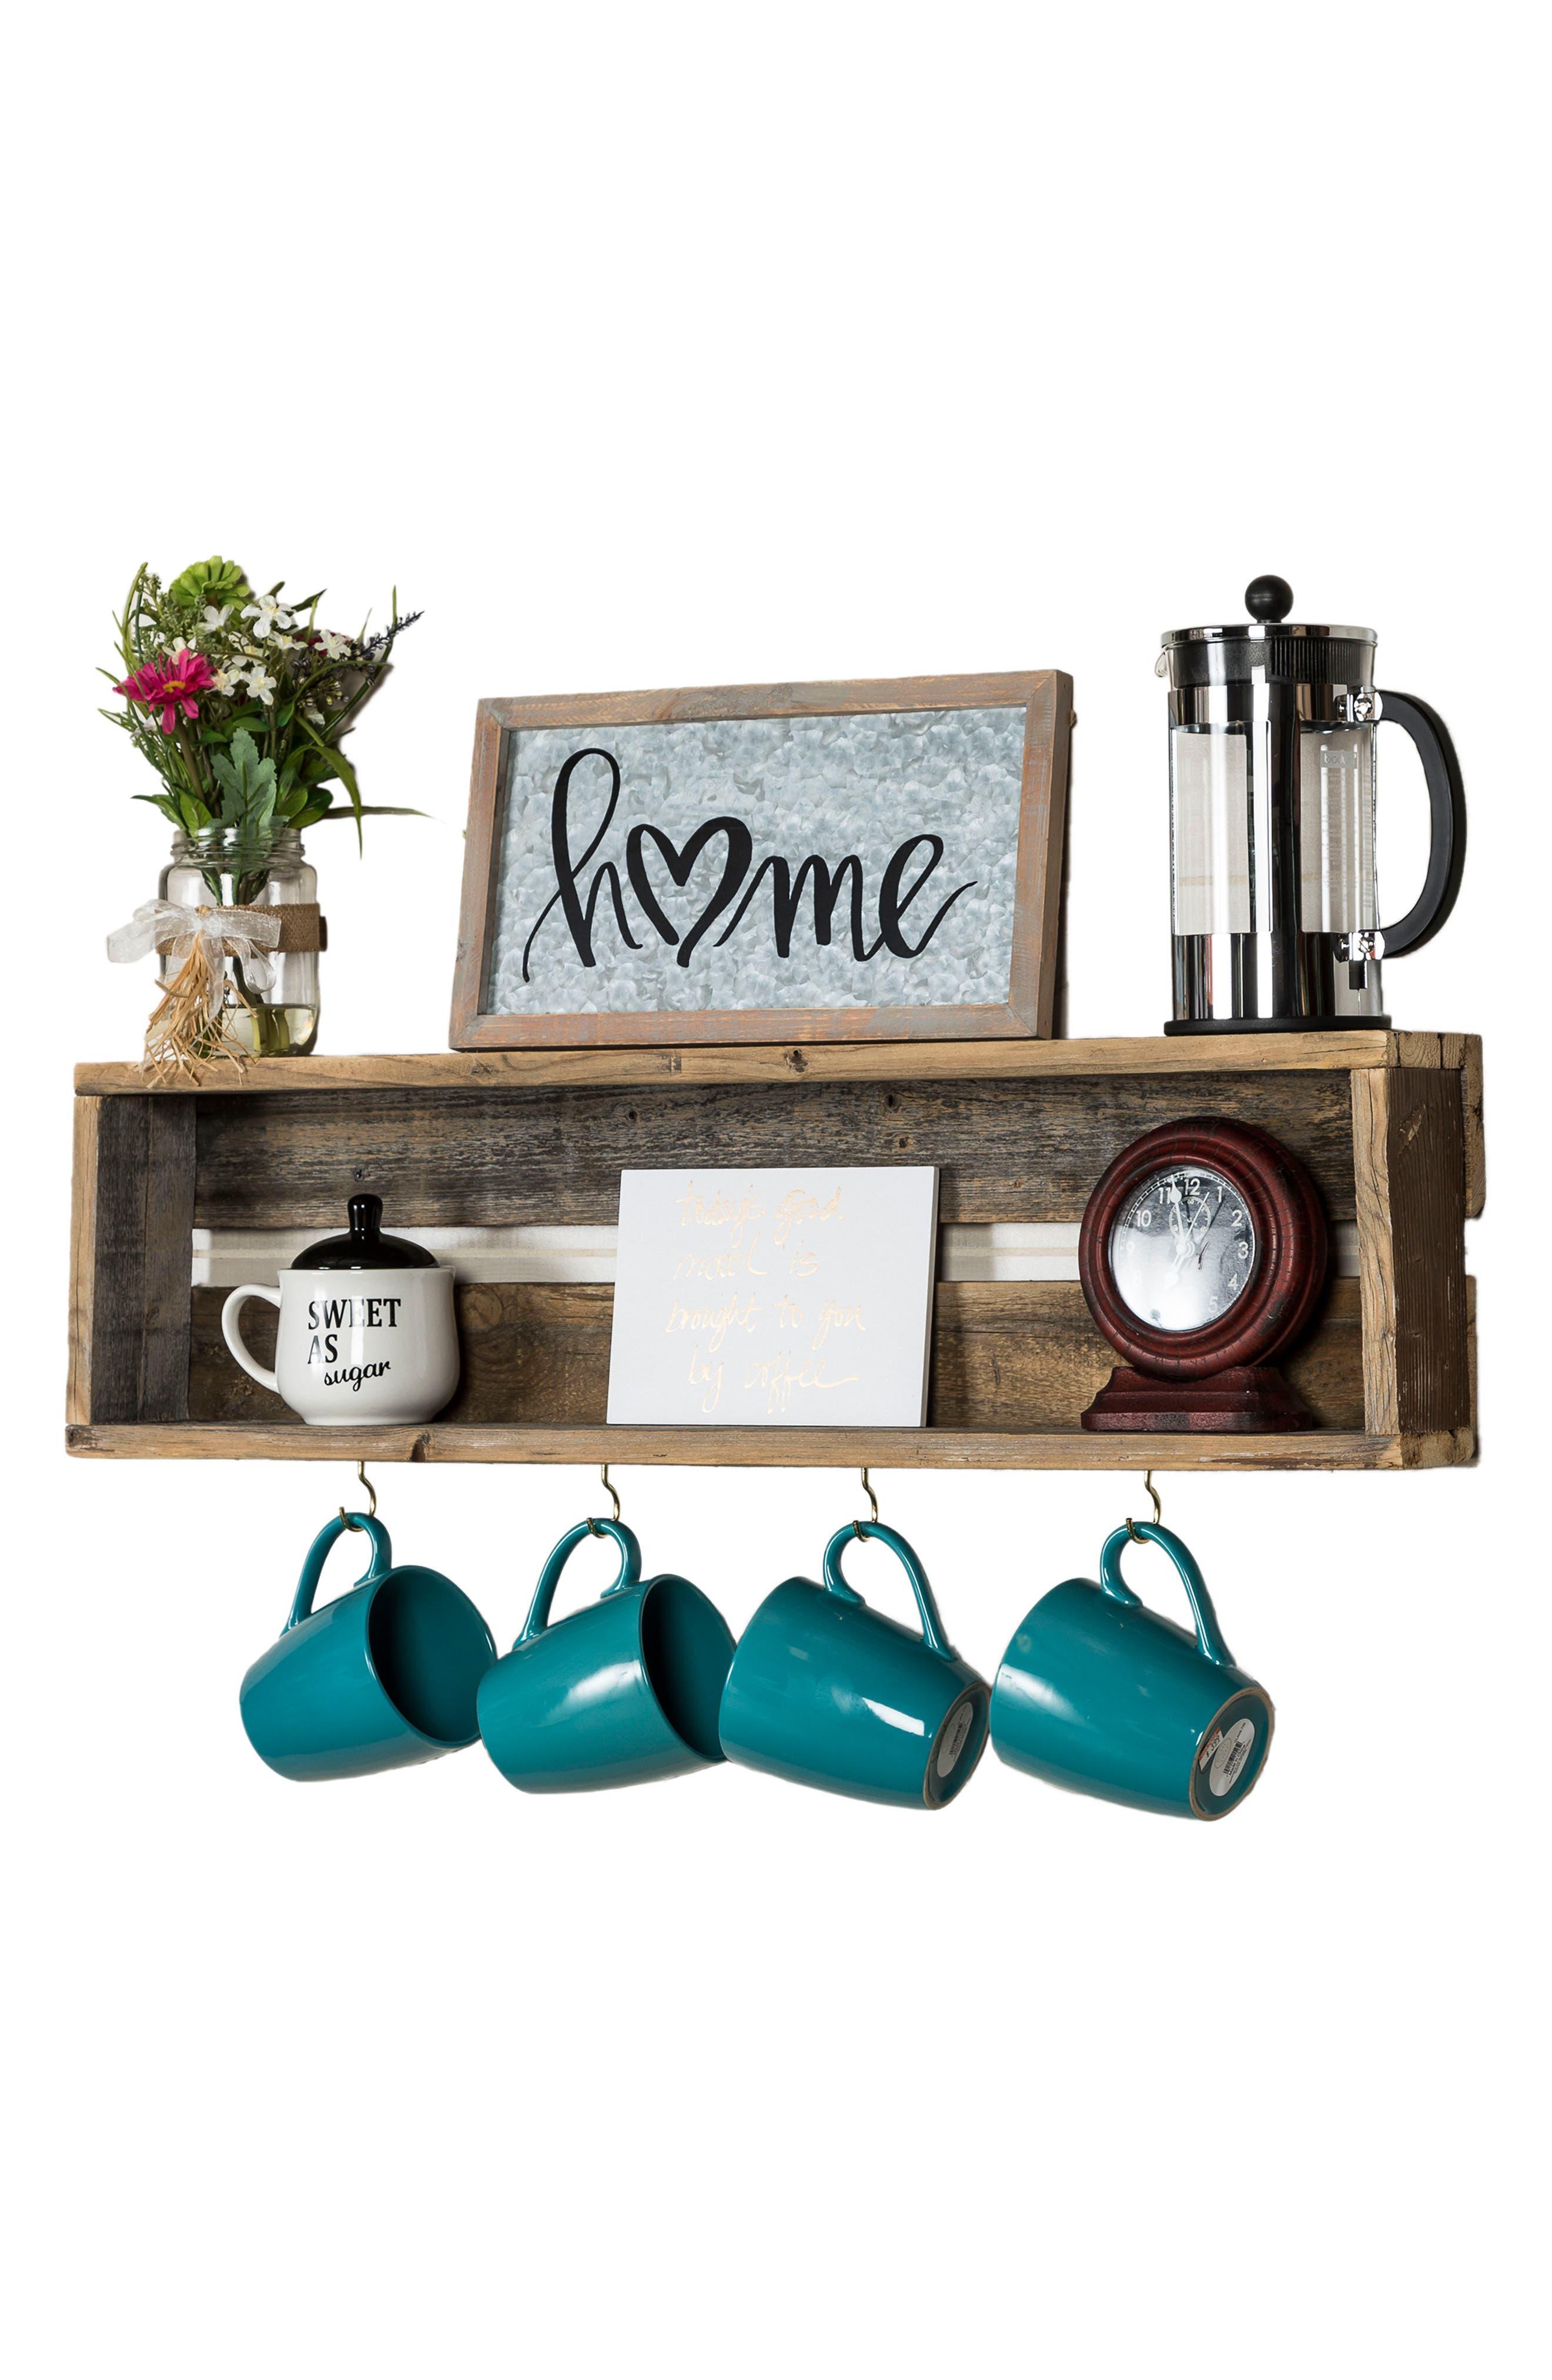 Repurposed Wood Shelf with Hooks,                             Alternate thumbnail 9, color,                             200